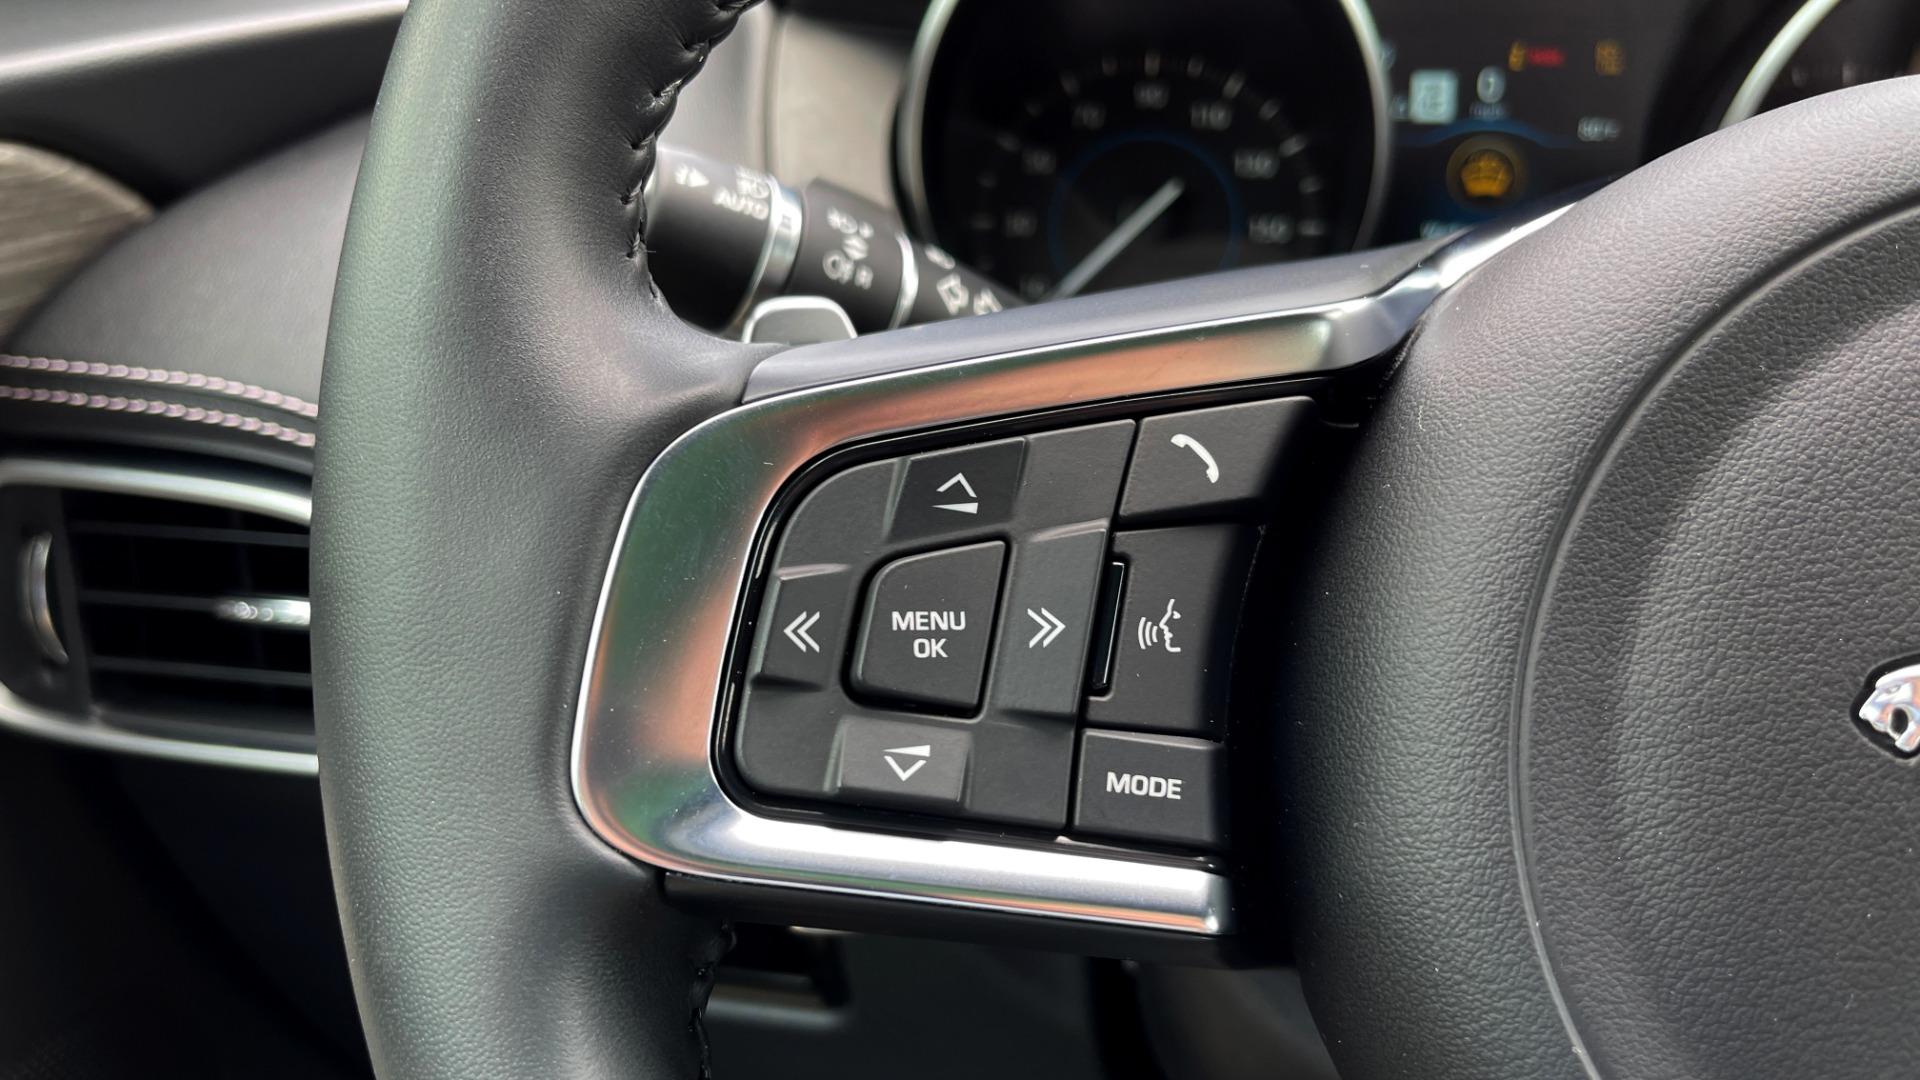 Used 2019 Jaguar F-PACE S / DRIVE PKG / BSA / HUD / BLACK EXT PKG / REARVIEW for sale $50,995 at Formula Imports in Charlotte NC 28227 32